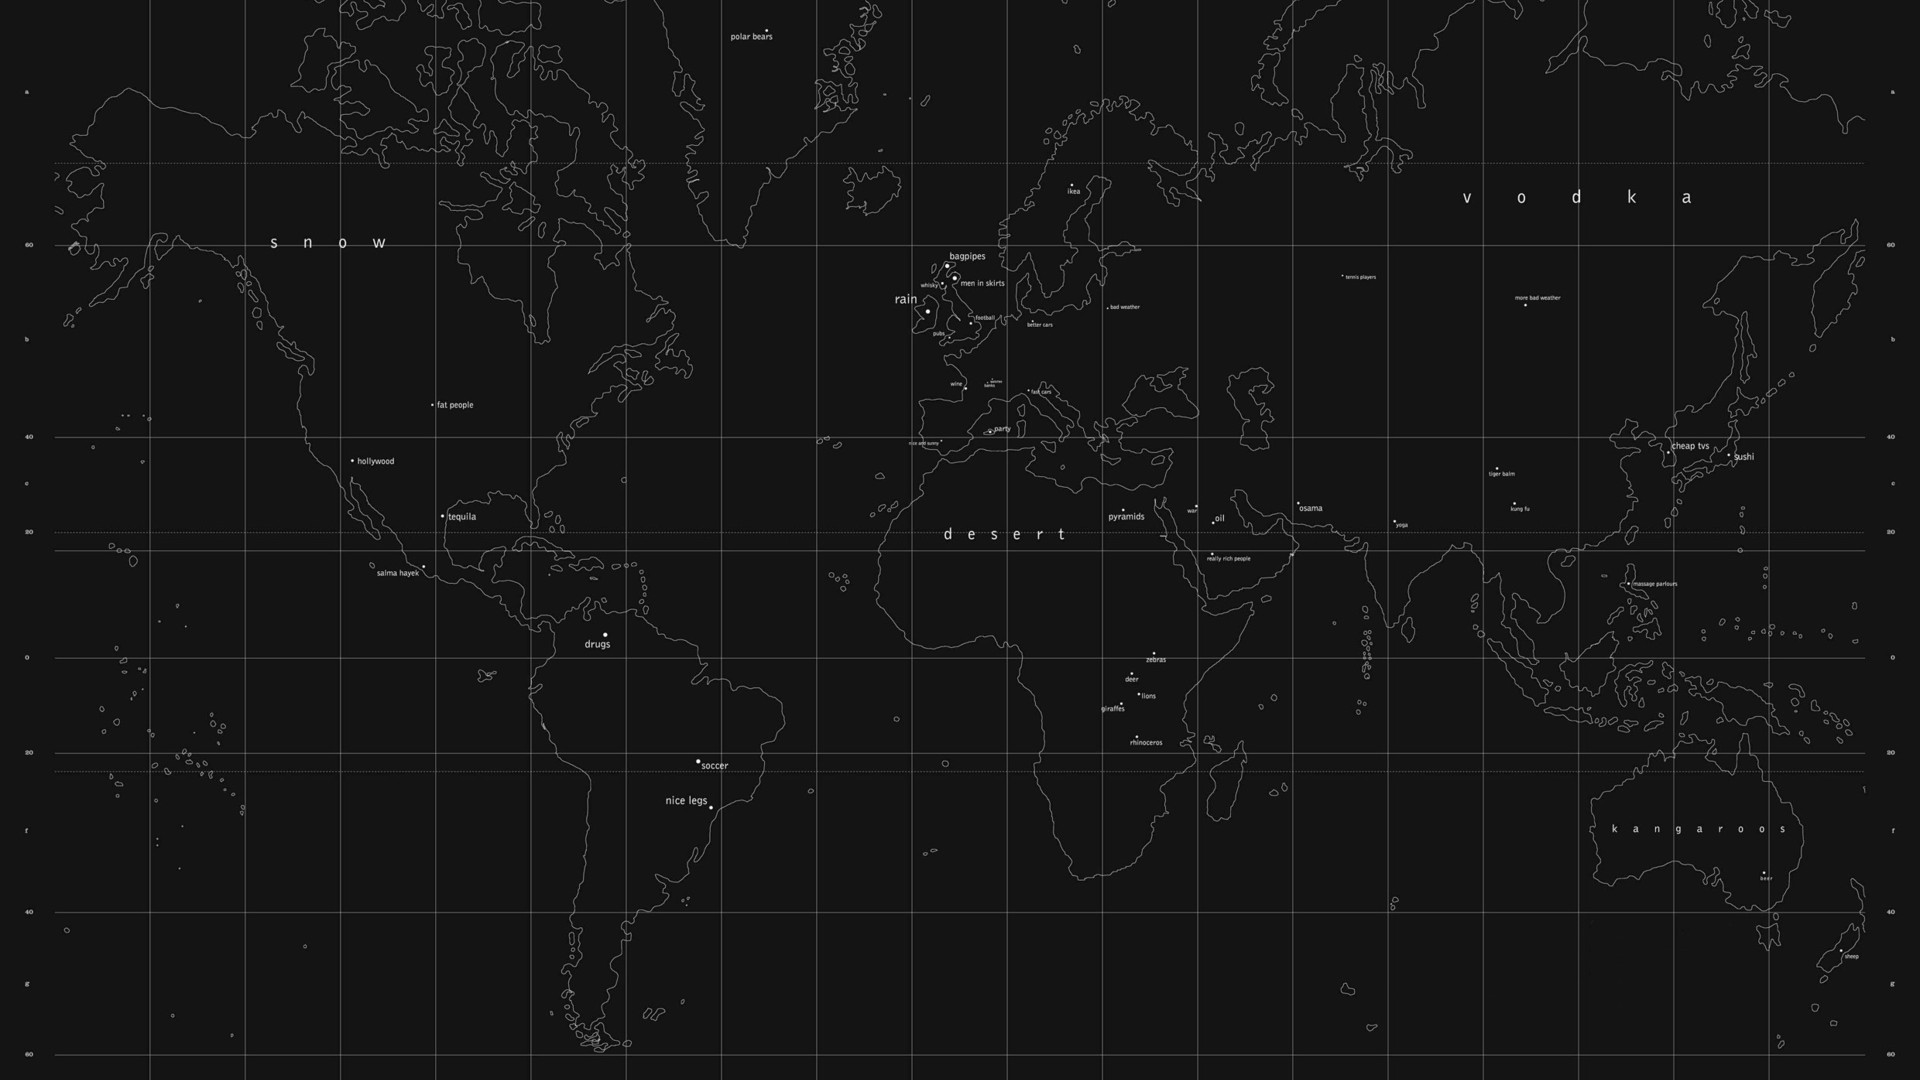 World map wallpaper high resolution wallpapersafari world map and major cities 1920x1080 gumiabroncs Images